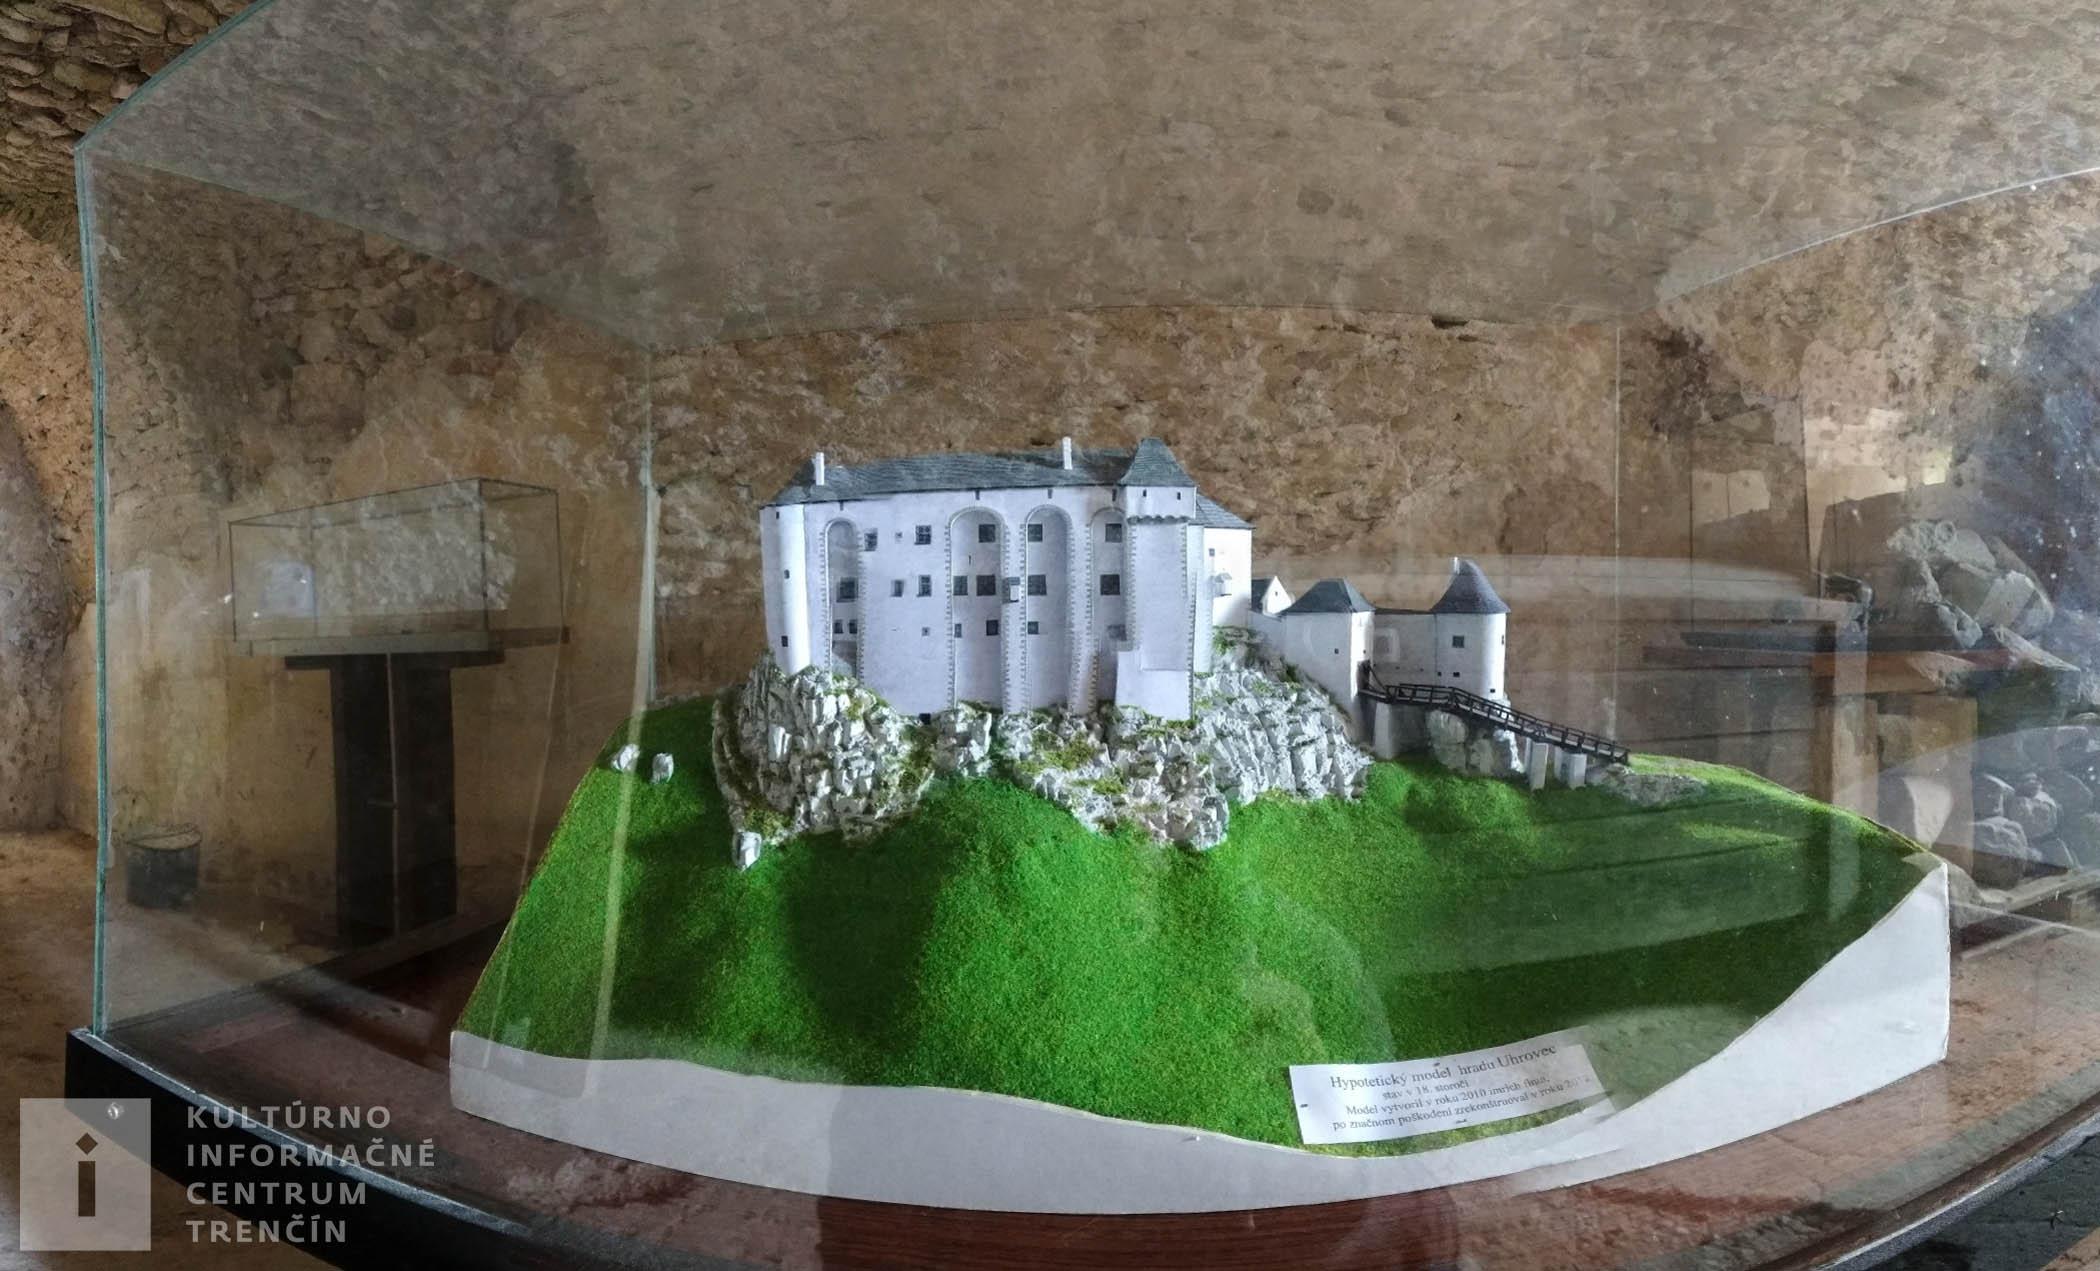 Maketa pôvodného stavu hradu Uhrovec/Model of original Castle Uhrovec